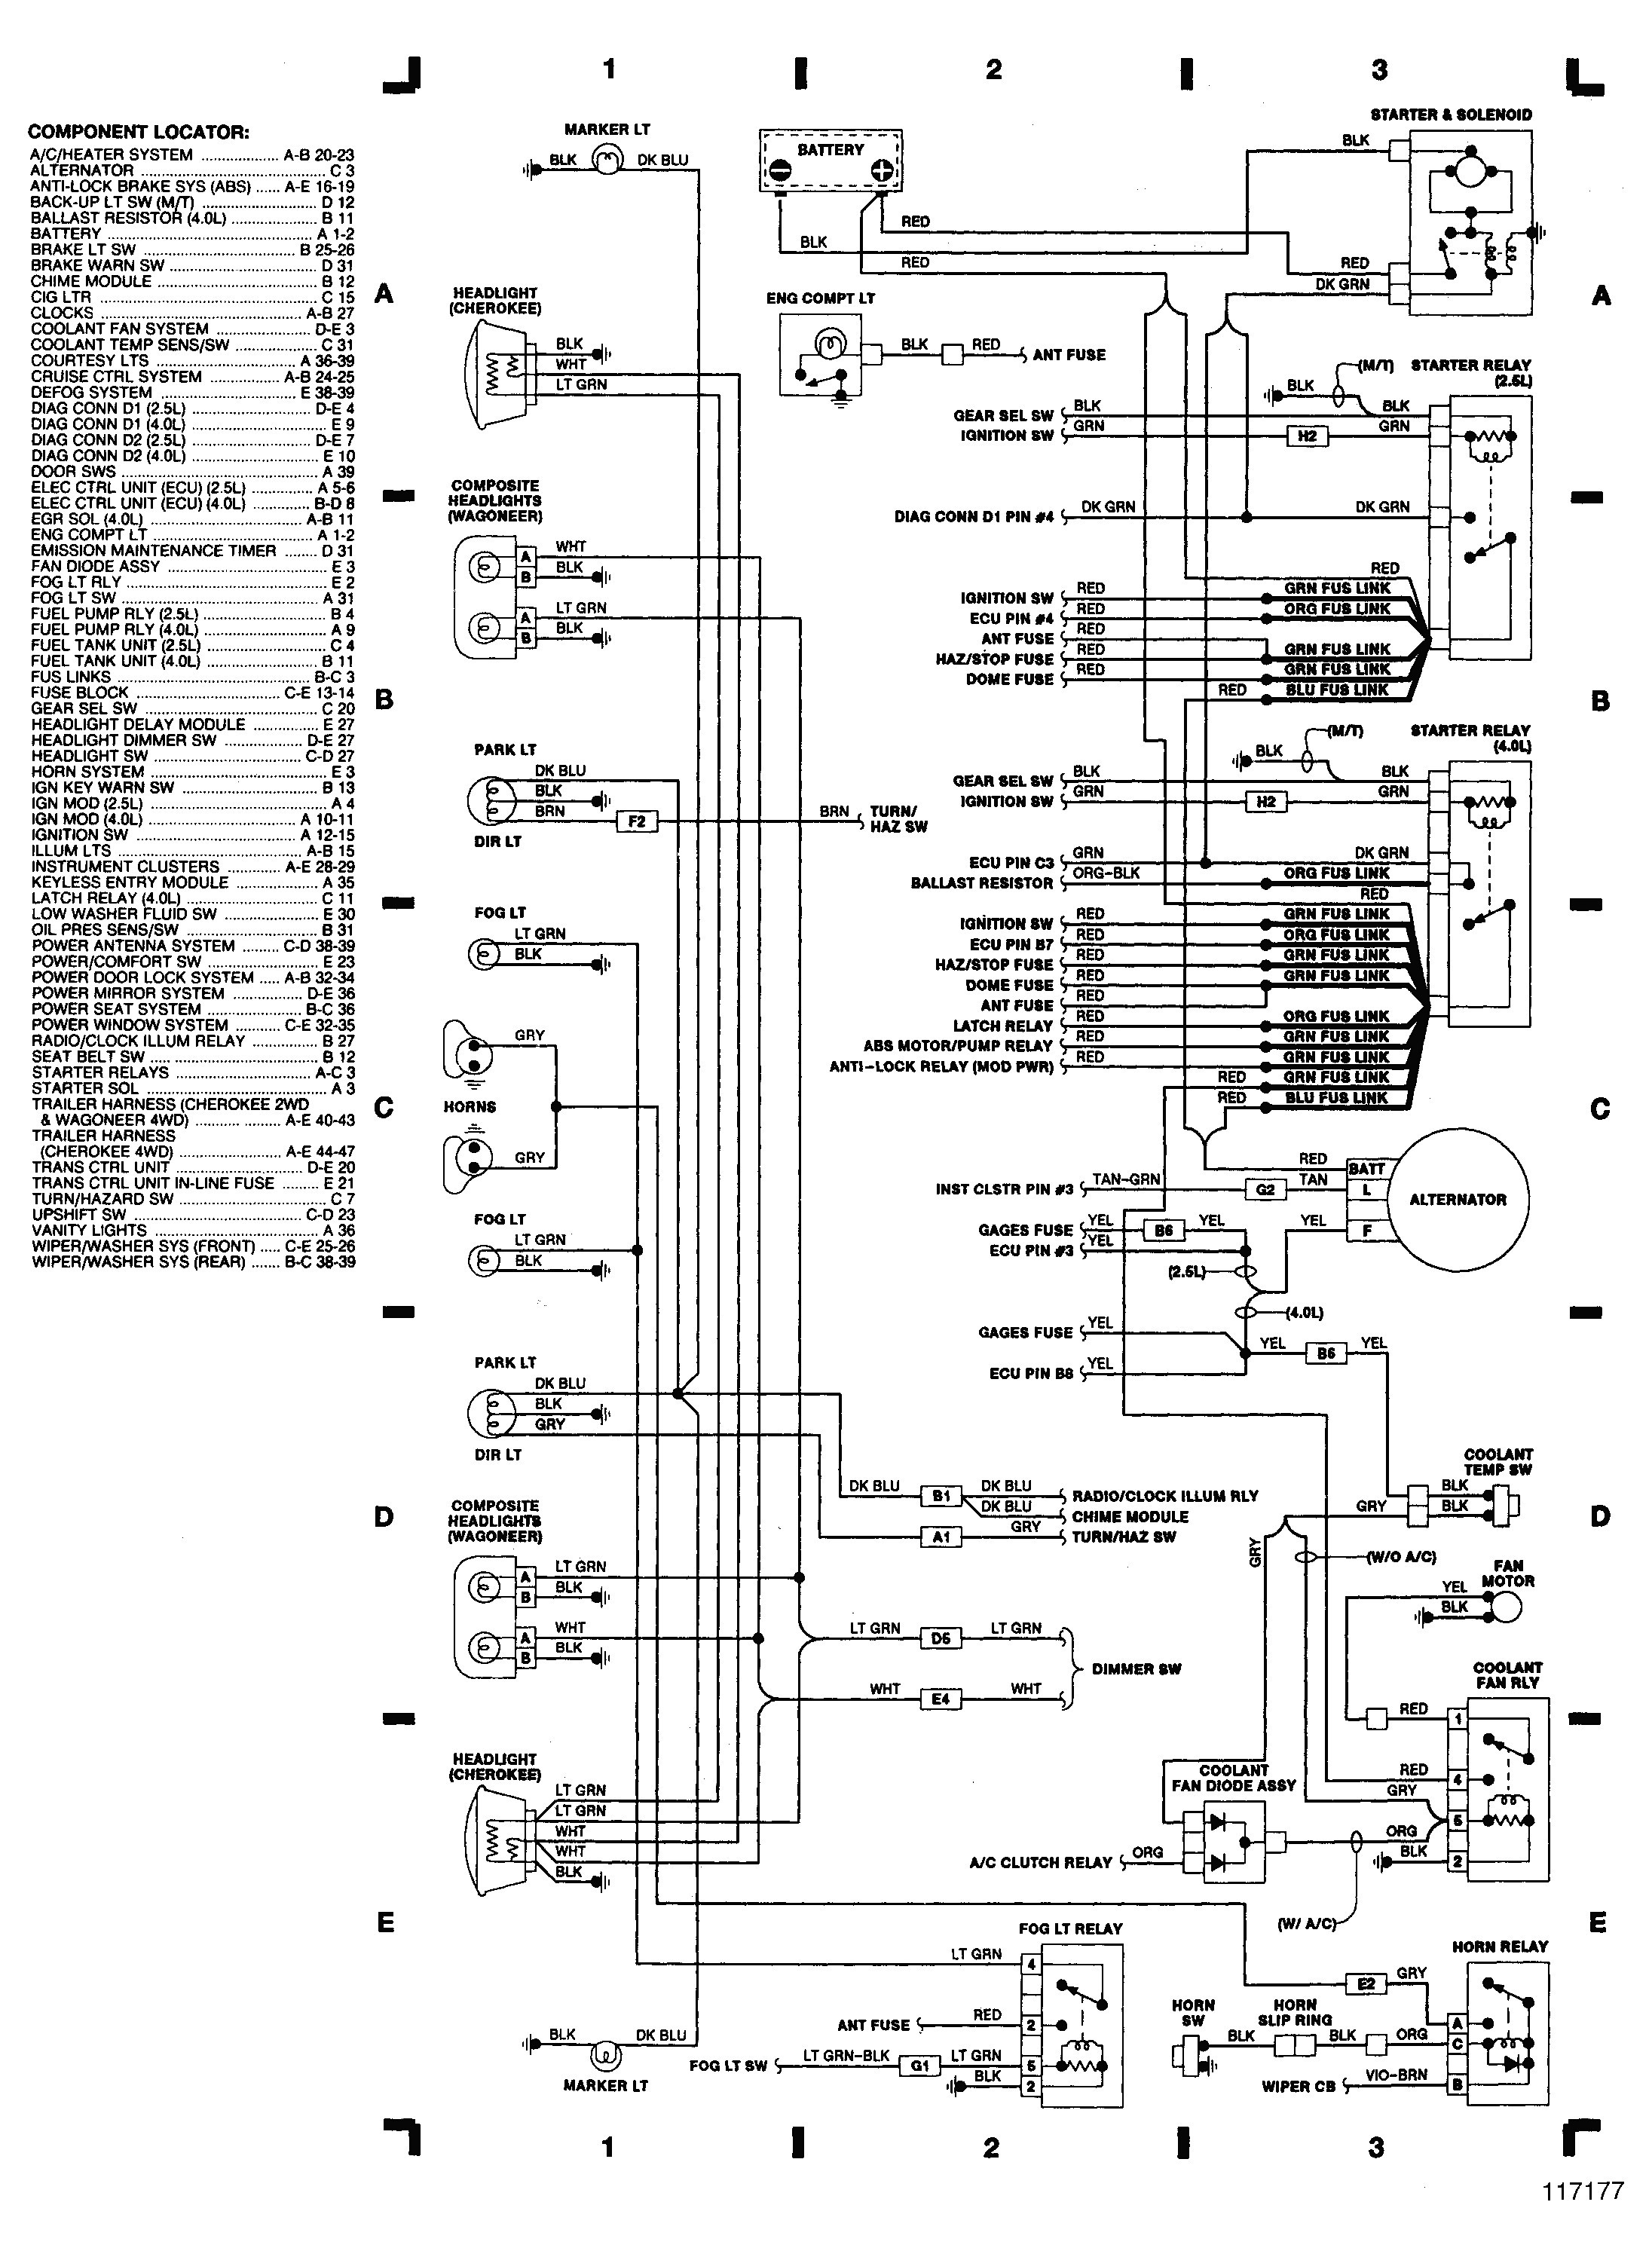 Jeep Wrangler Jk Wiring Diagram Free Save 99 Jeep Wrangler Wiring Diagram With D Fair Carlplant